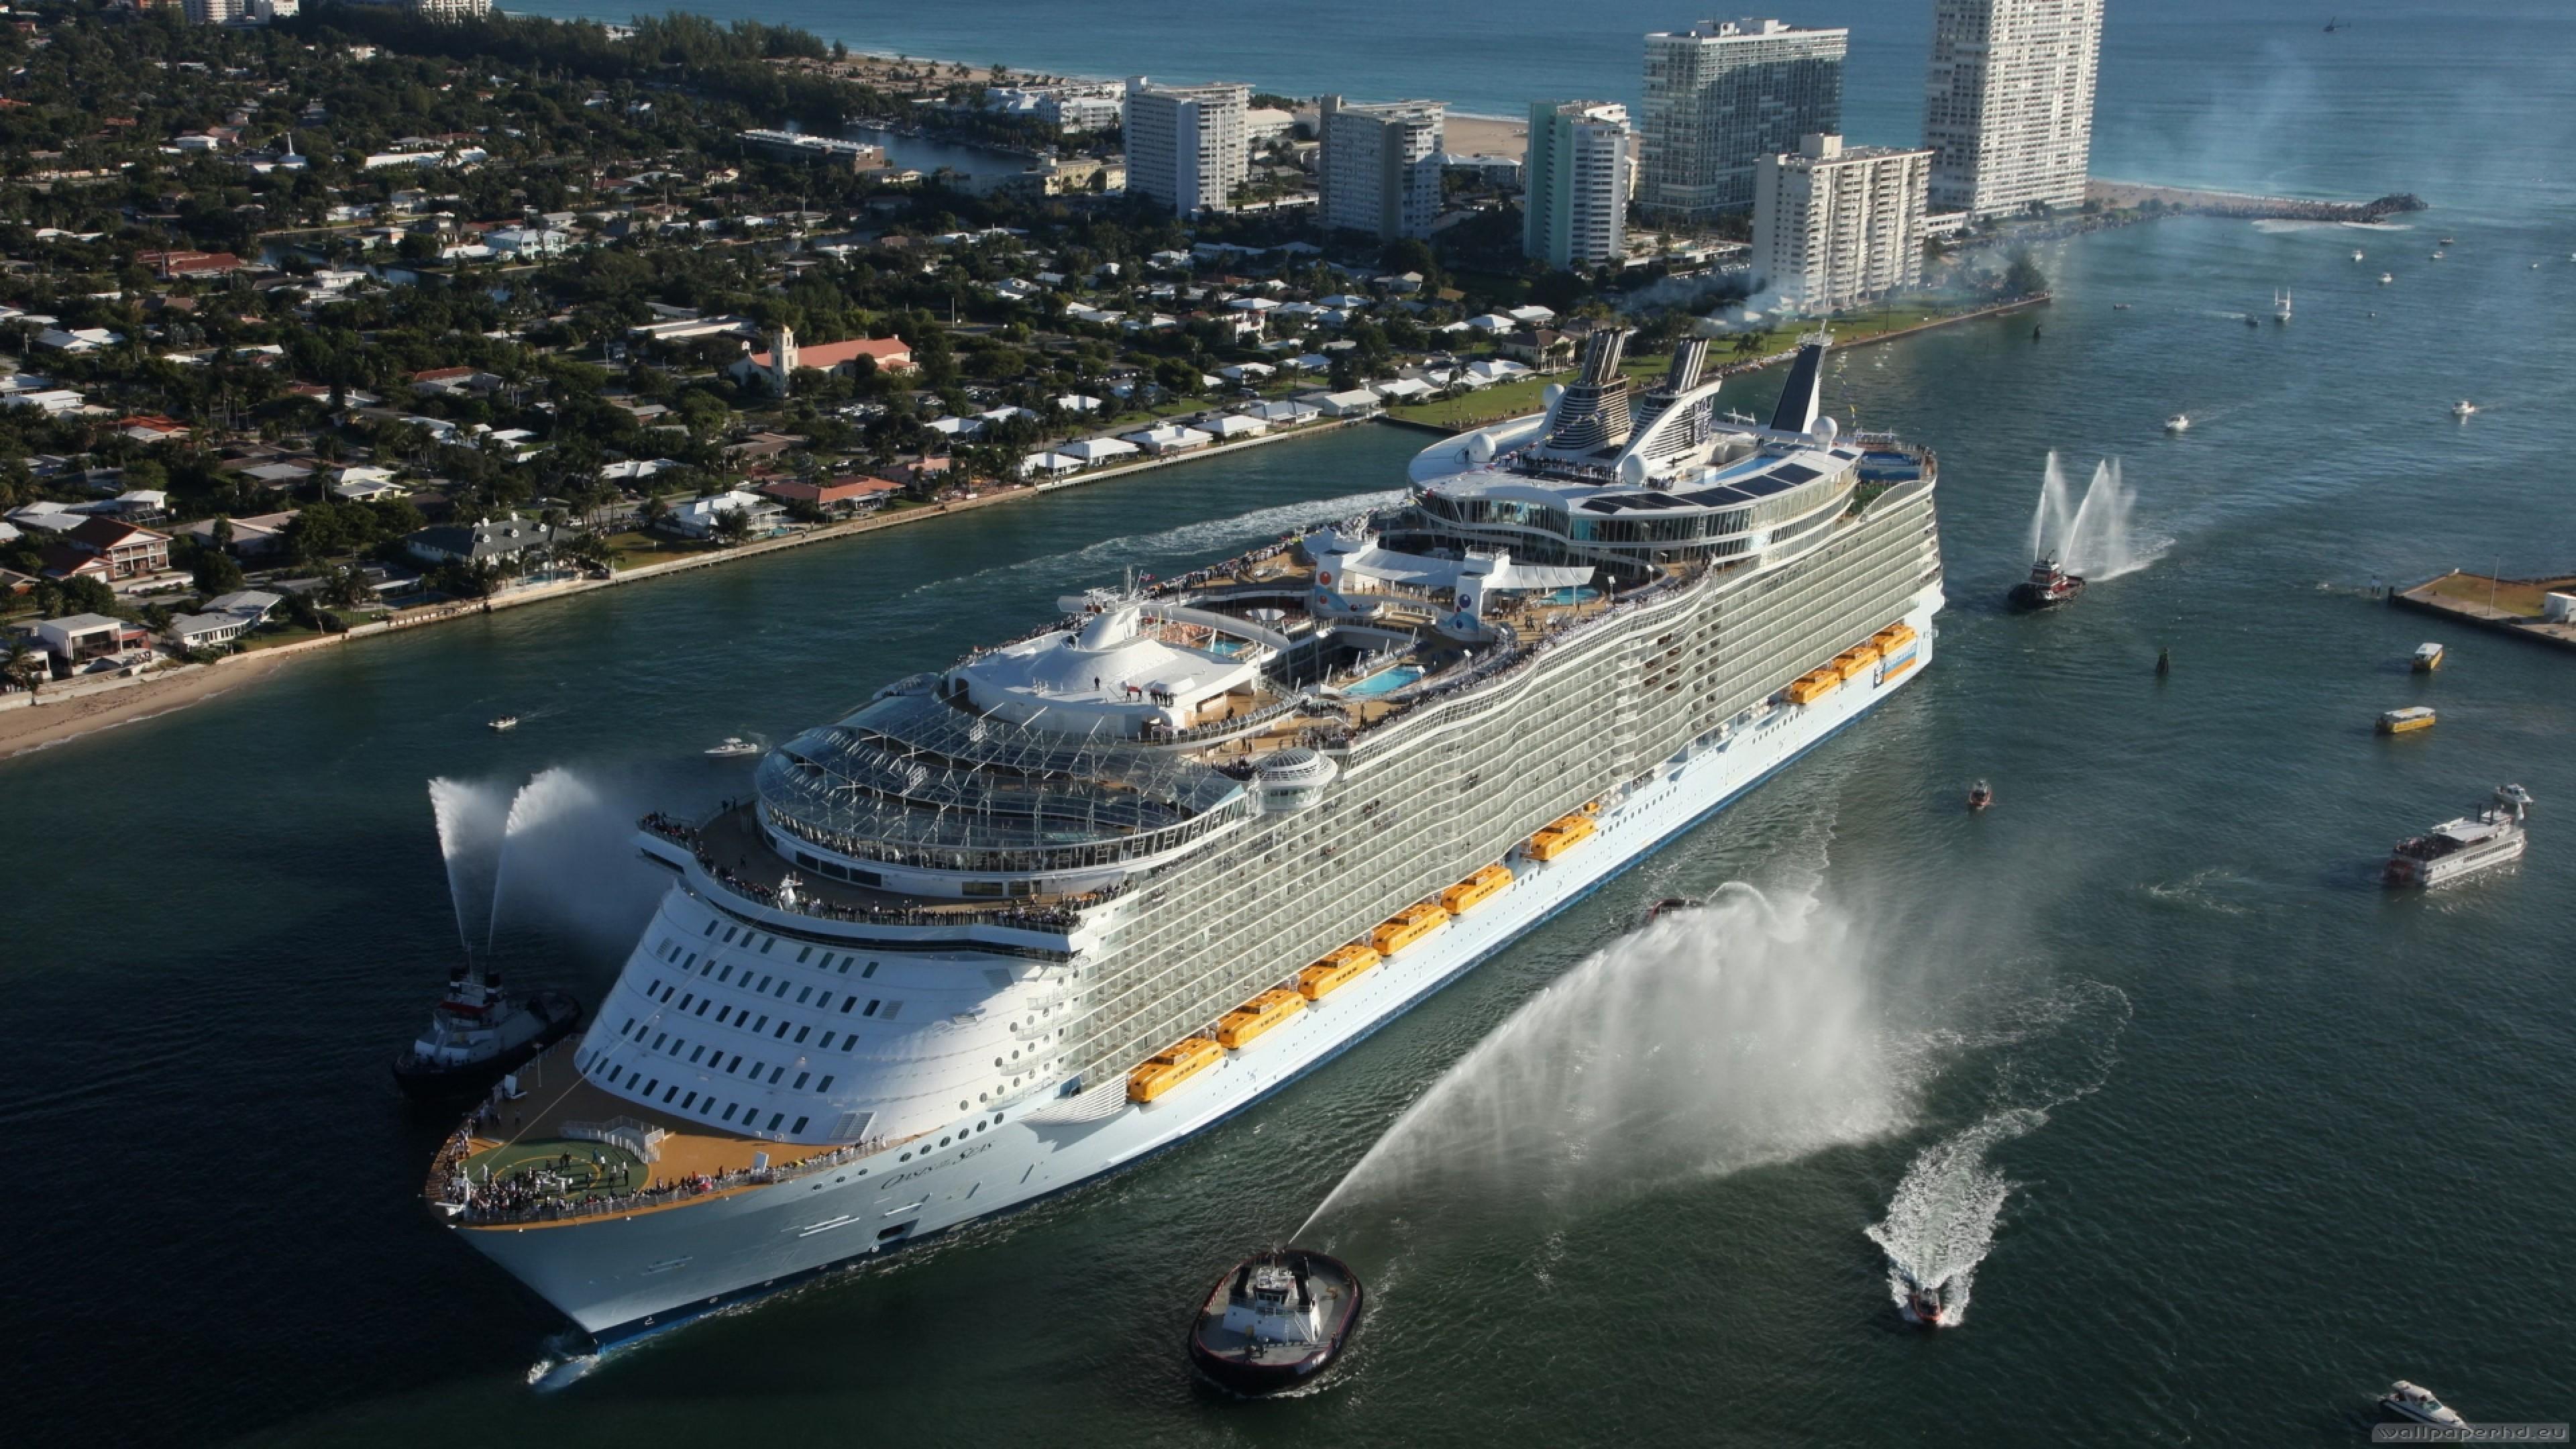 Hd Wallpaper Cruise Ship Hd Wallpapers Trend